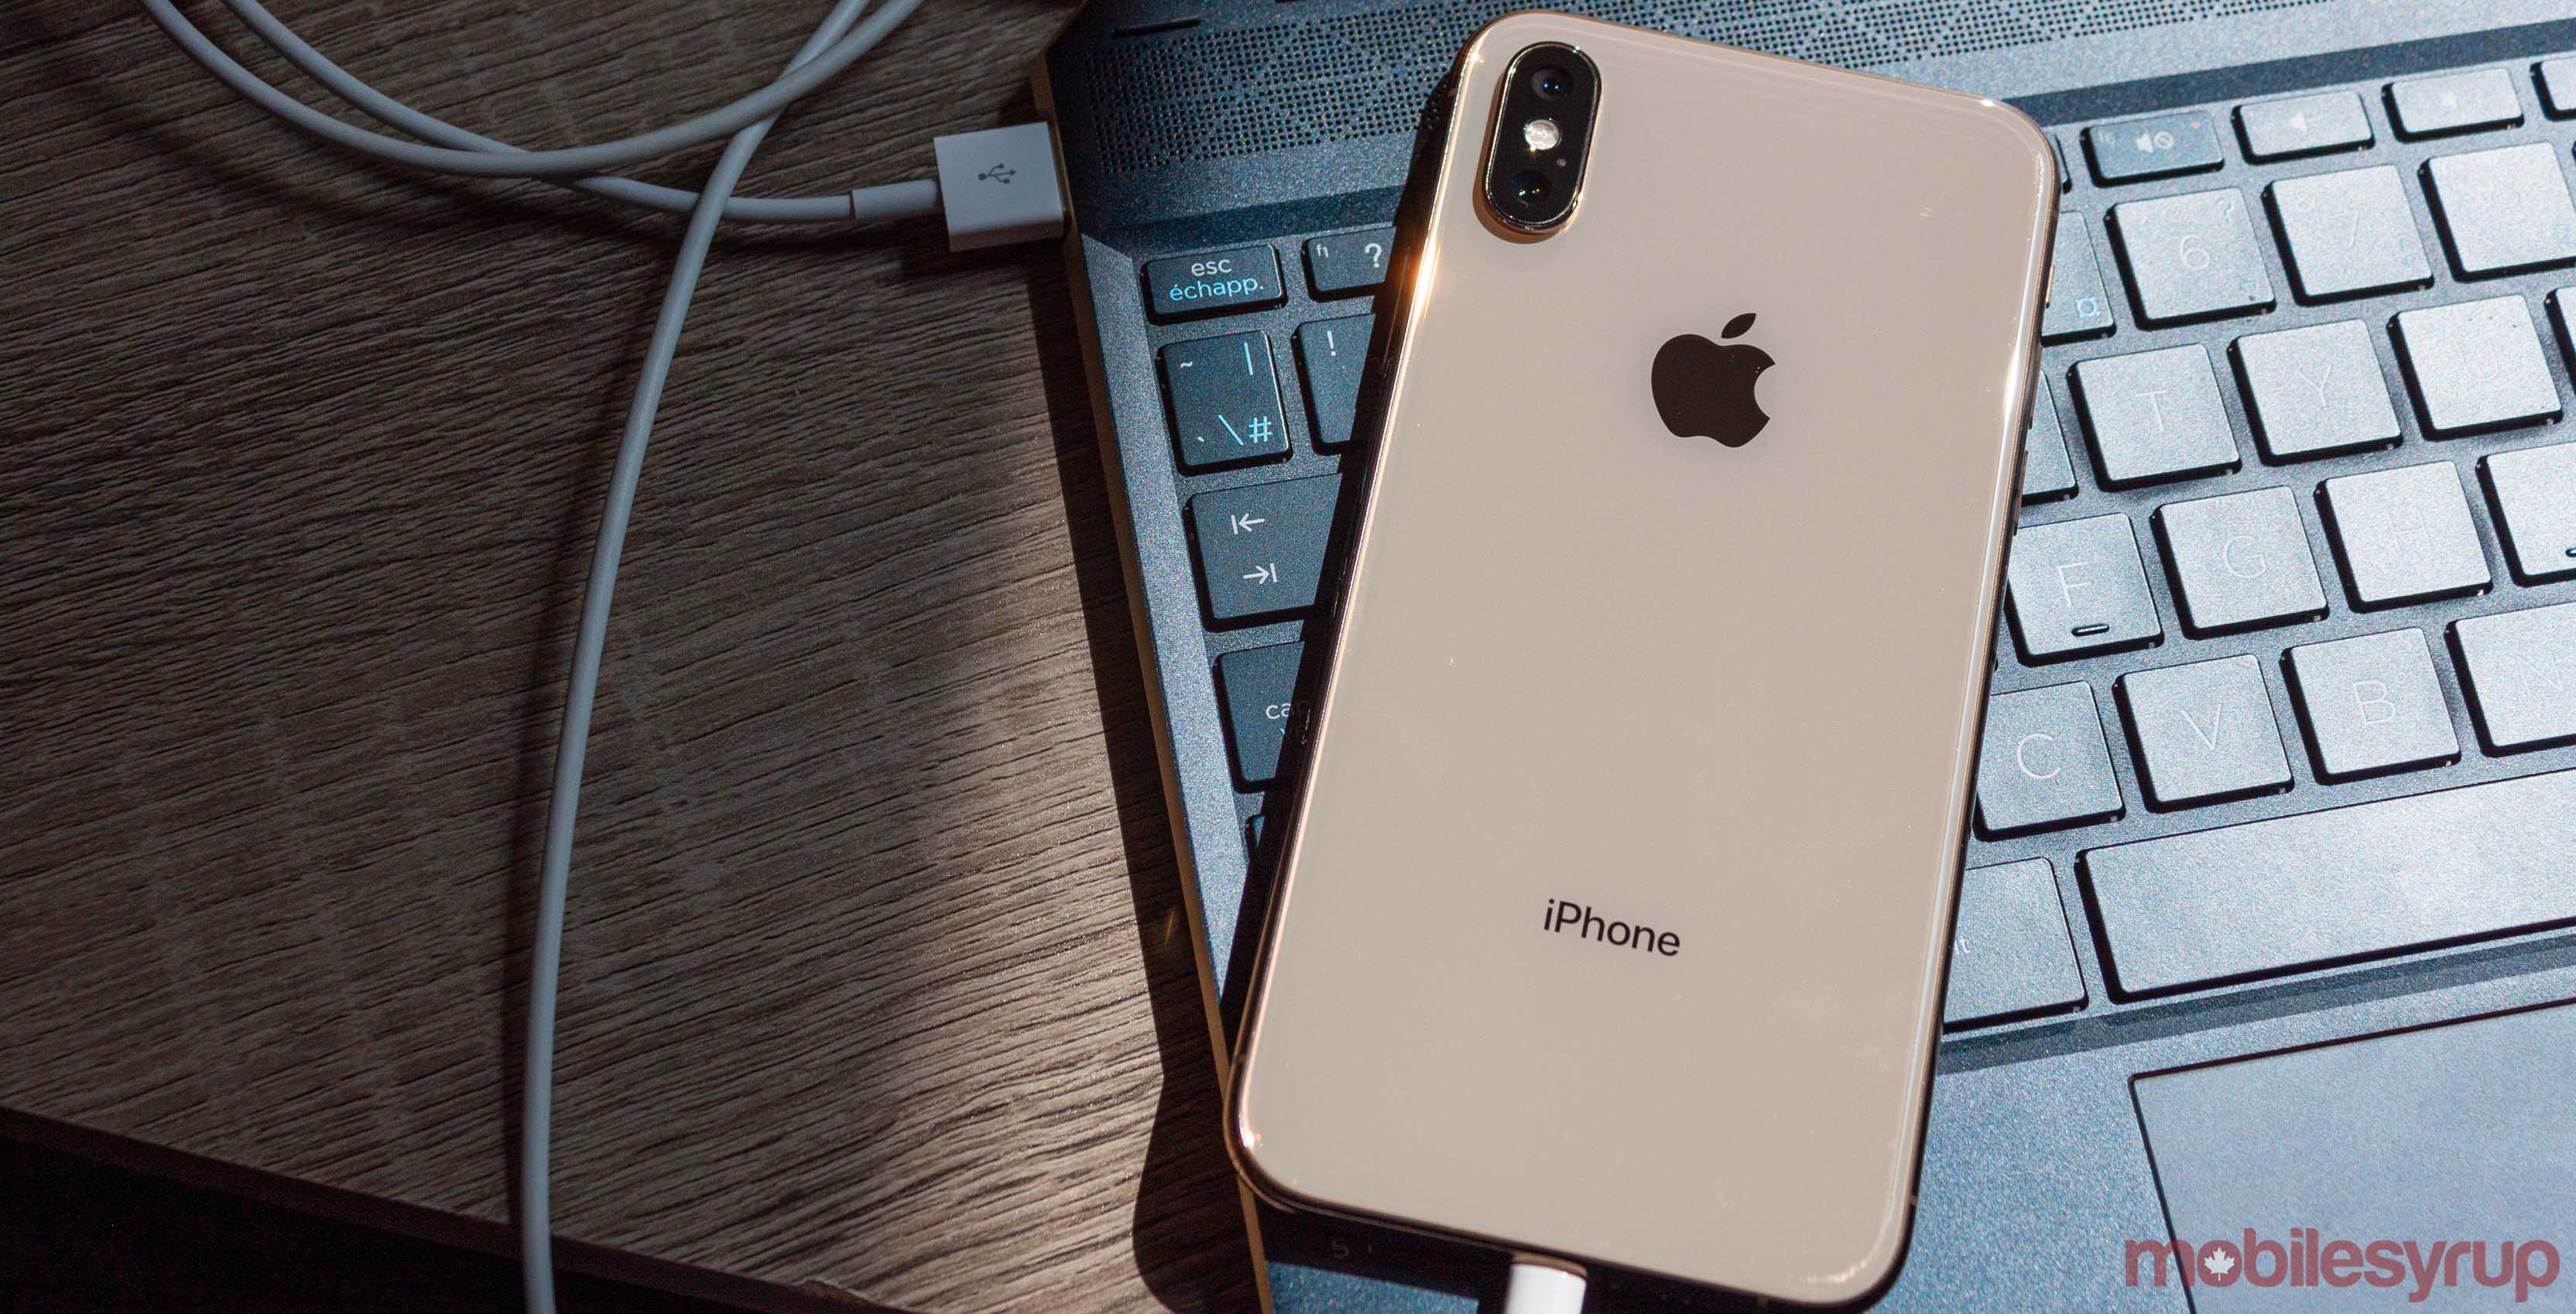 iPhone USB tethering